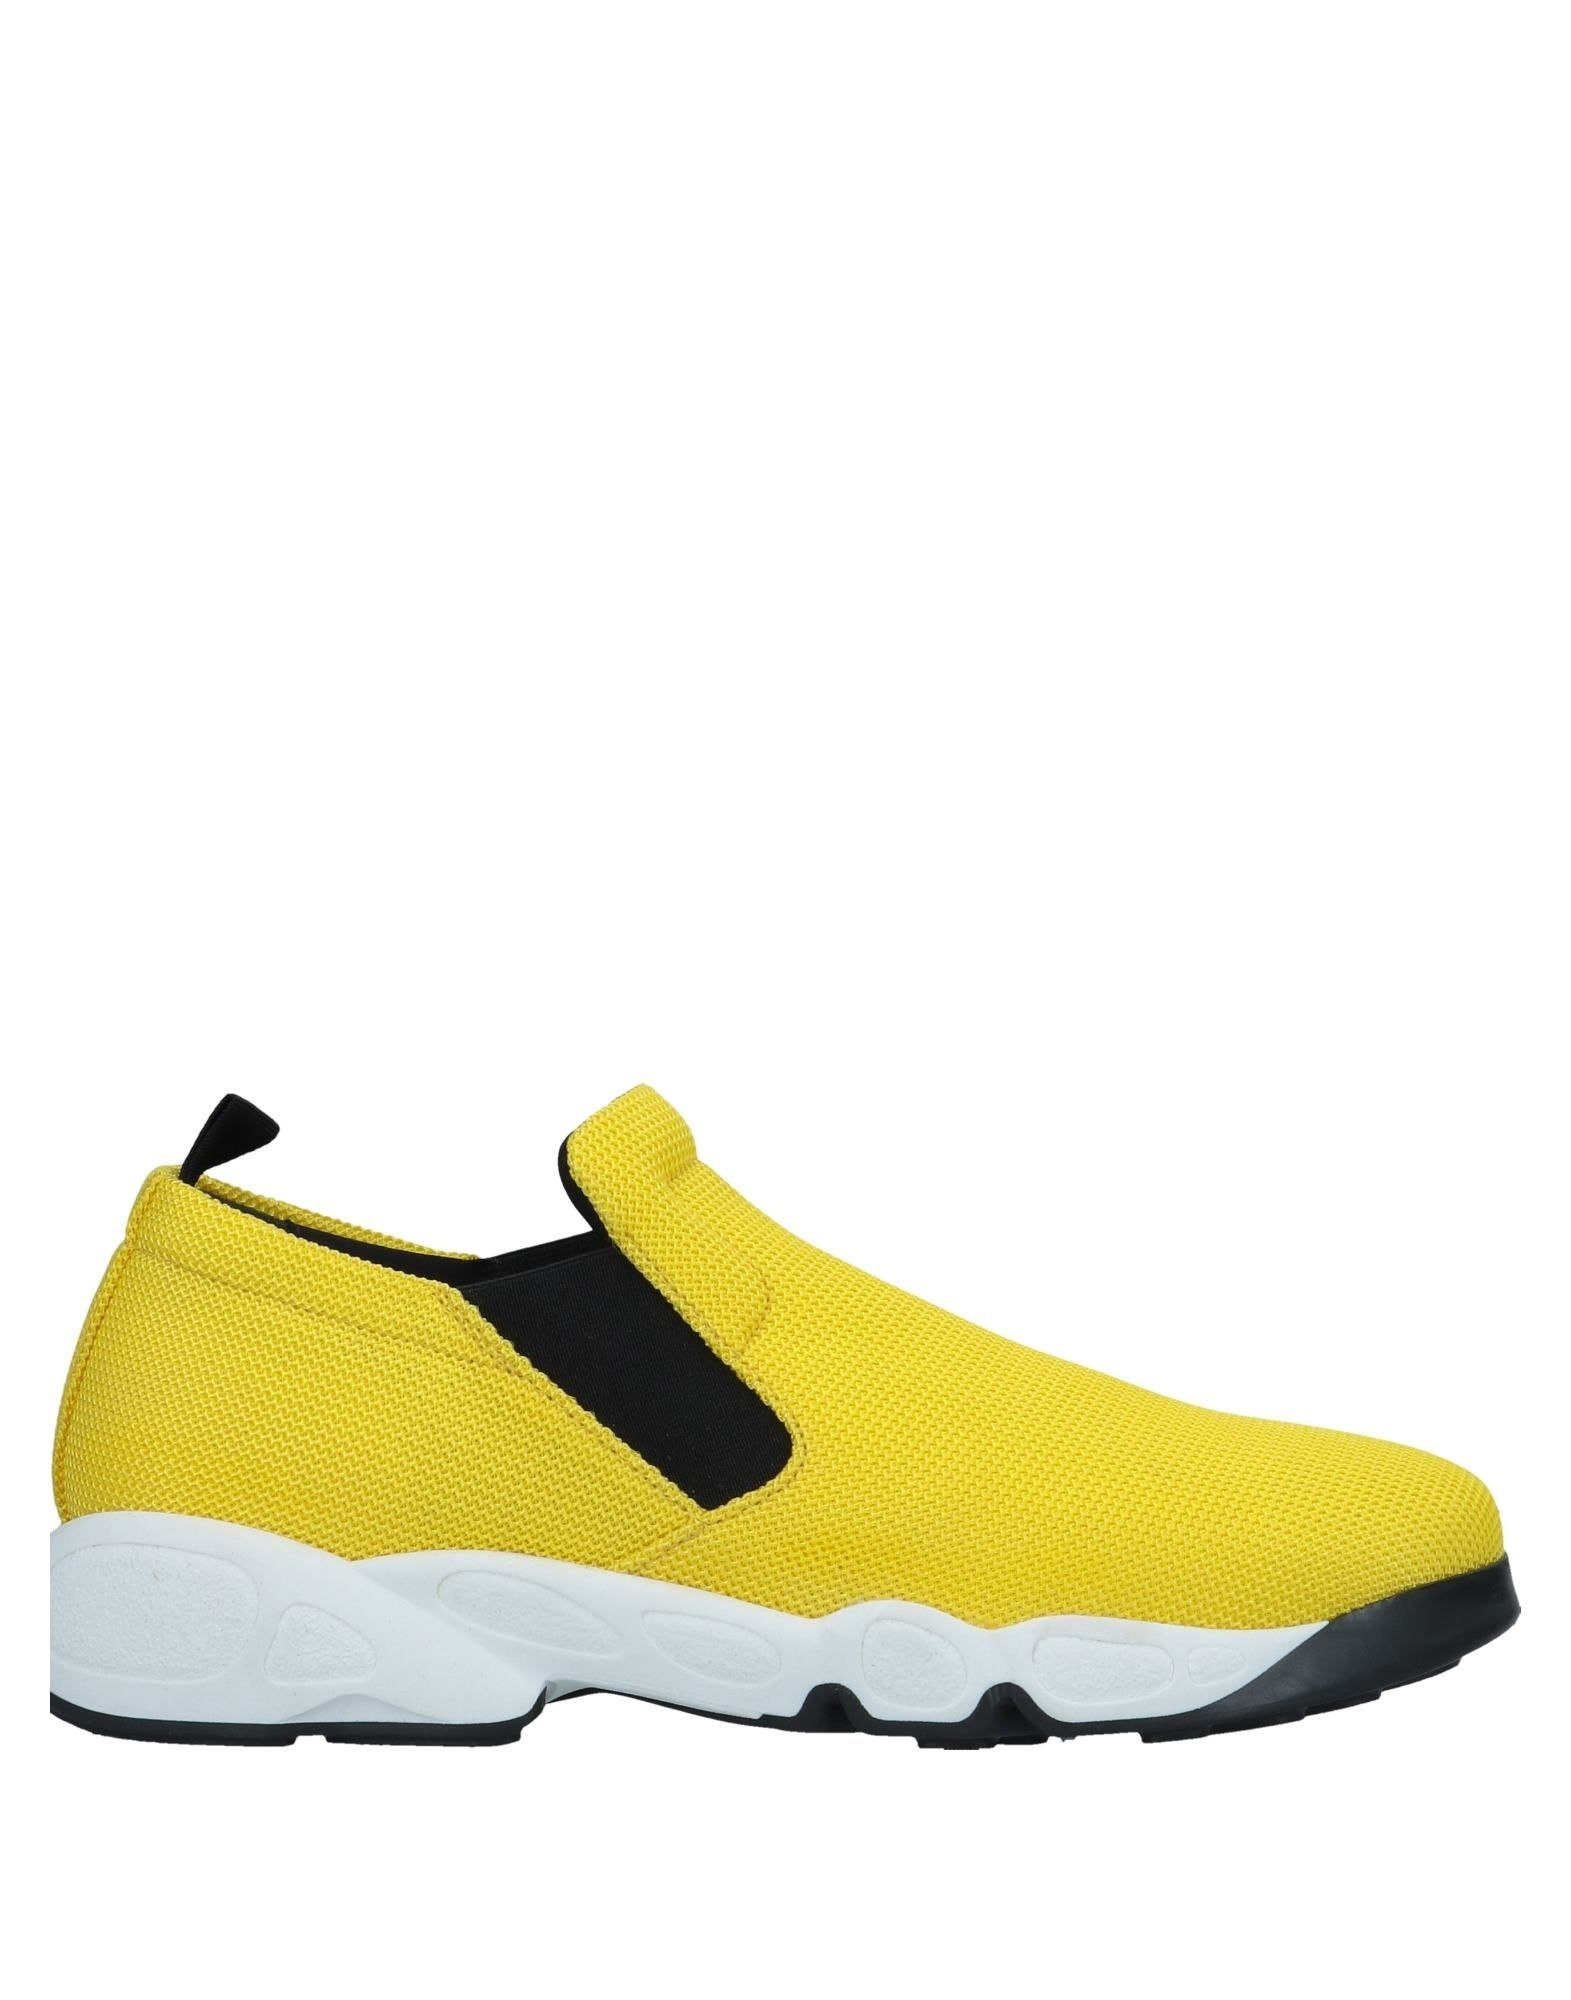 Erika Cavallini Sneakers - Women Erika Cavallini Sneakers online 11580632BQ on  Australia - 11580632BQ online a28419